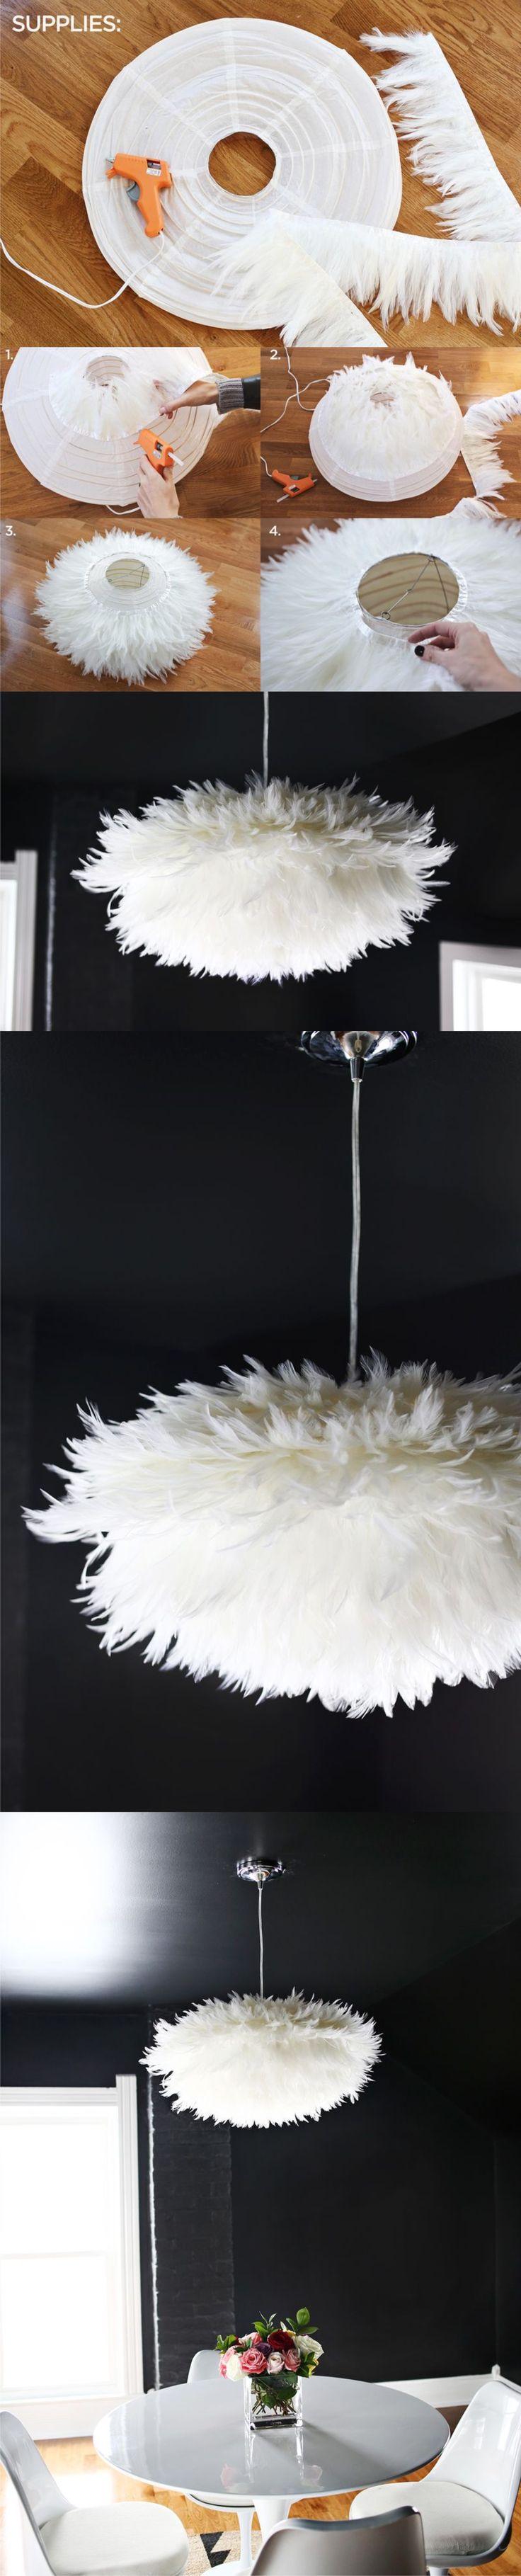 lampara con plumas DIY muy ingenioso 2